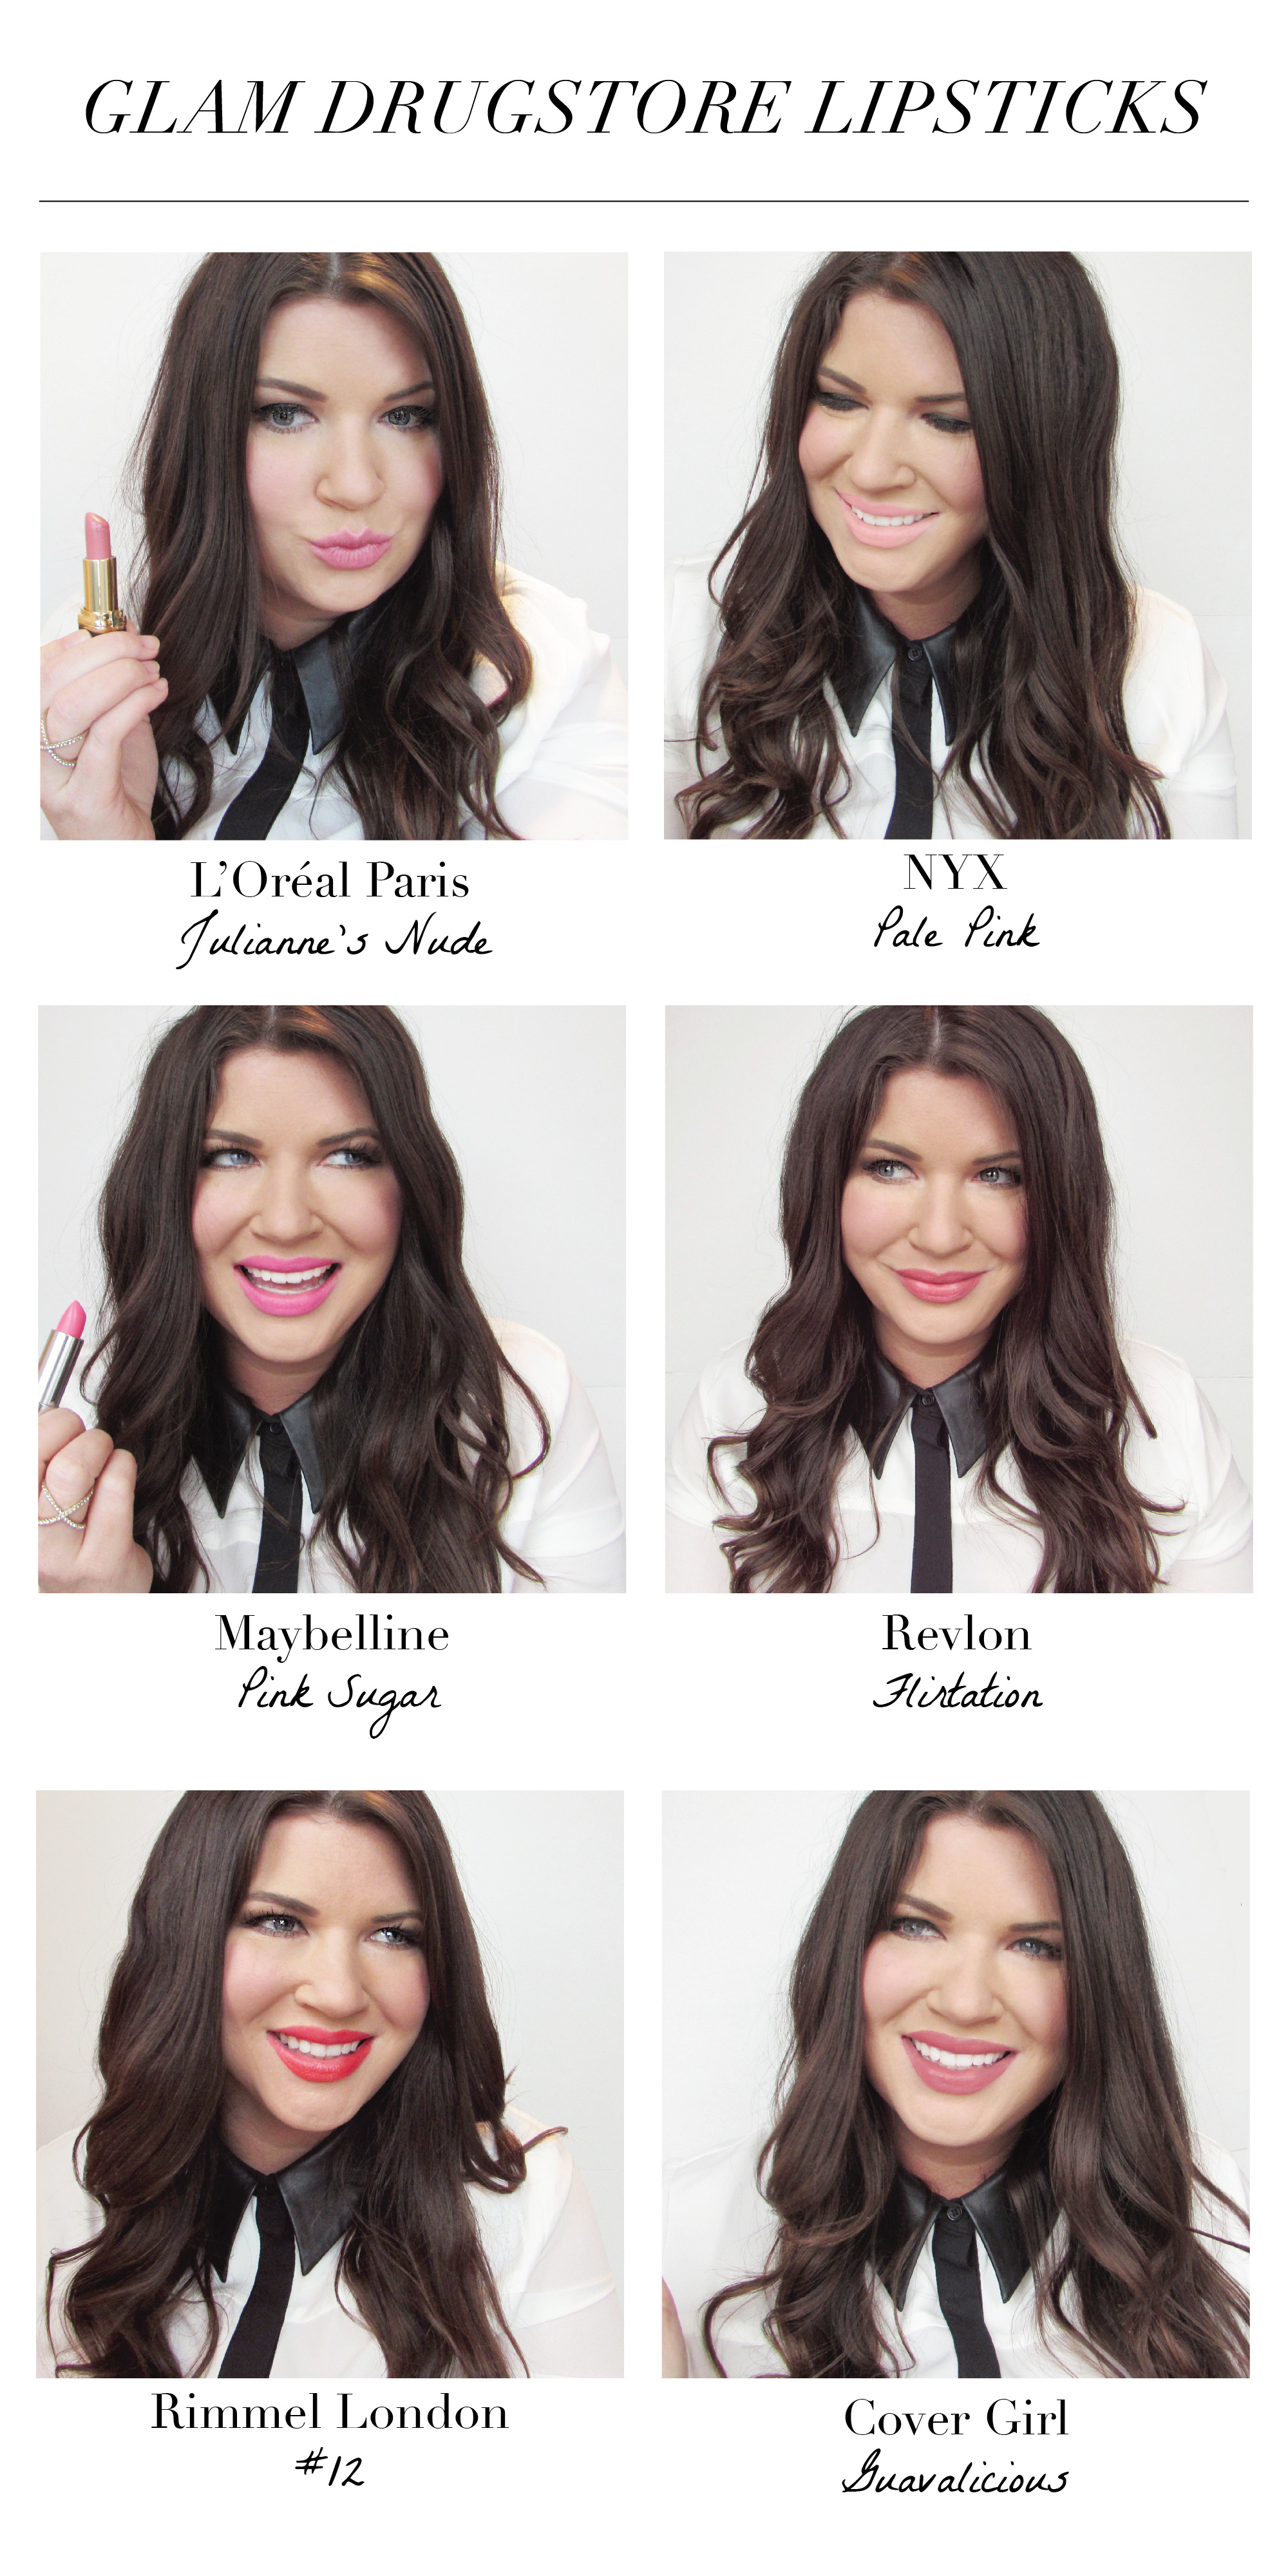 Glam Drugstore Lipsticks